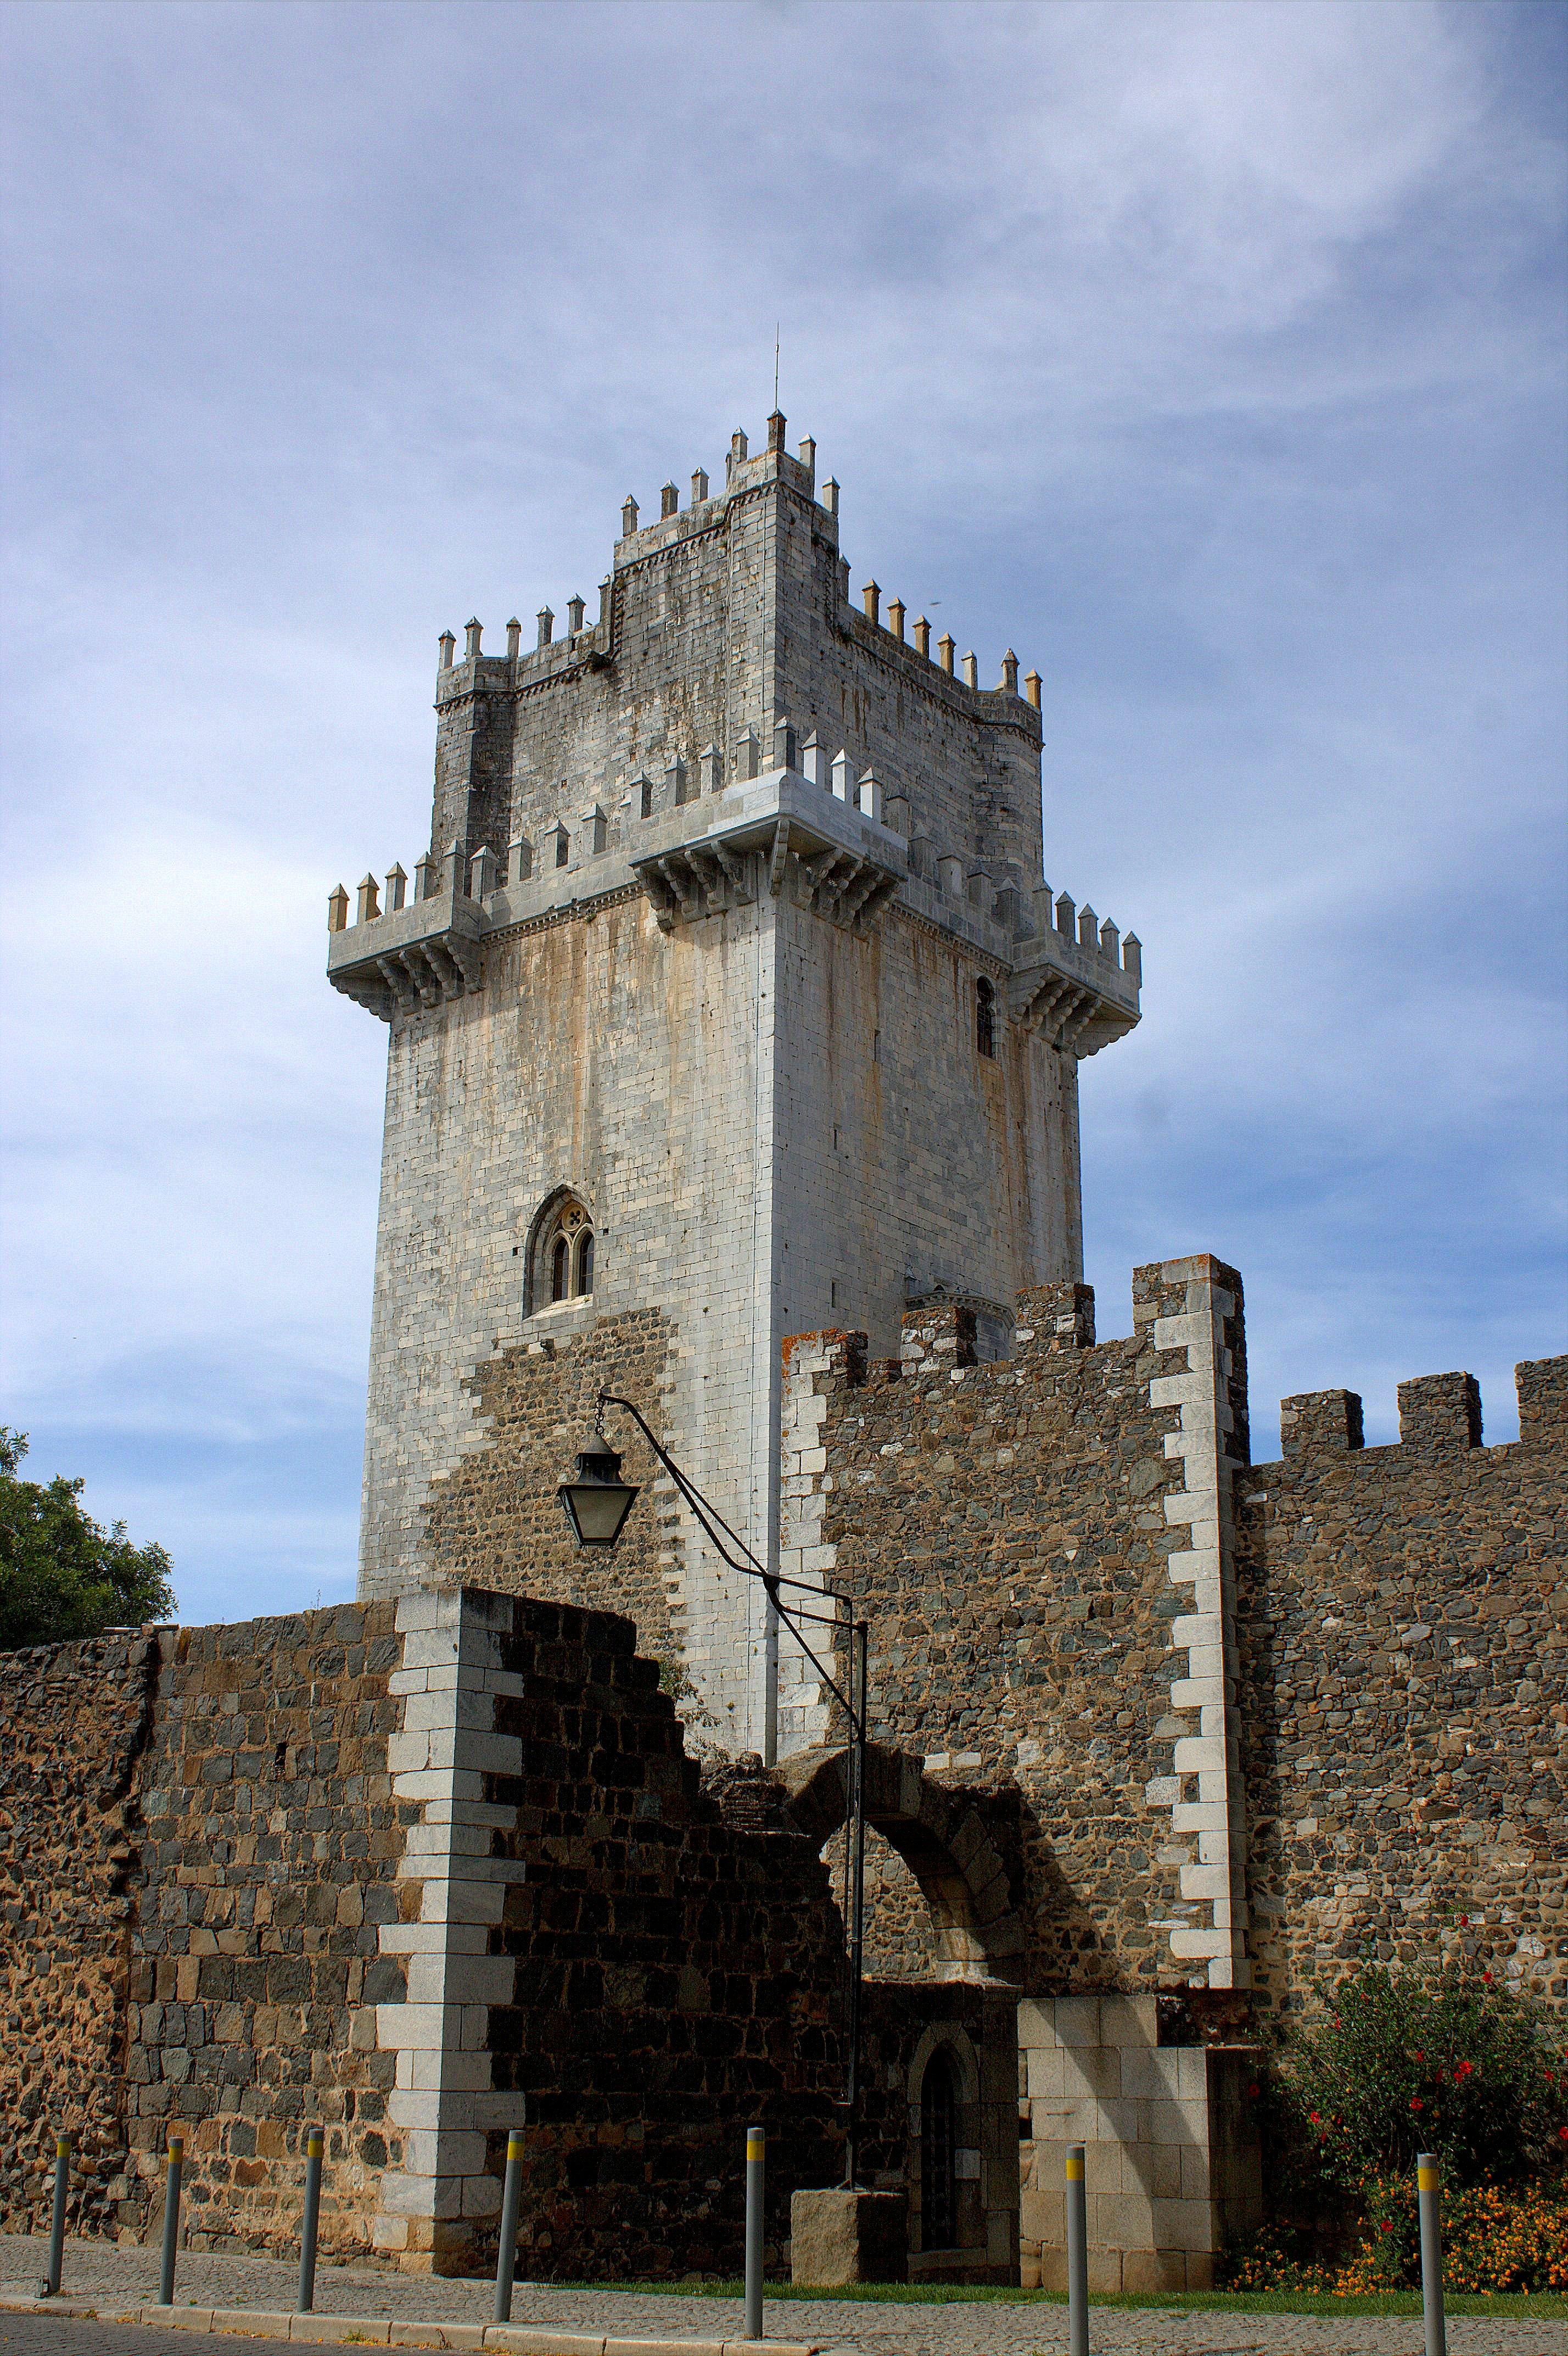 33. Beja Castle, Portugal